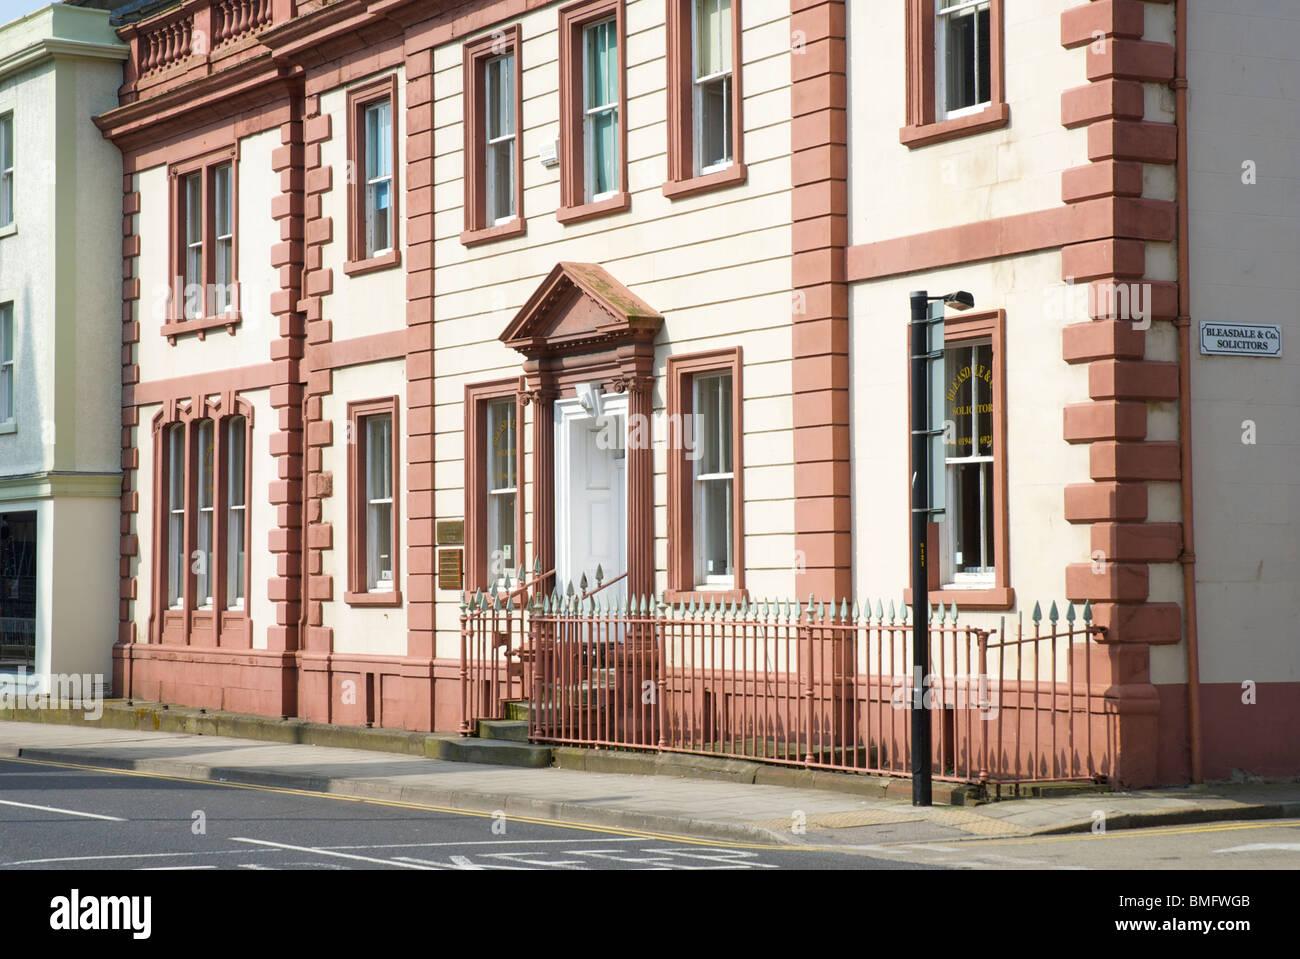 L'architecture géorgienne à Whitehaven, Cumbria, Angleterre, Royaume-Uni Photo Stock